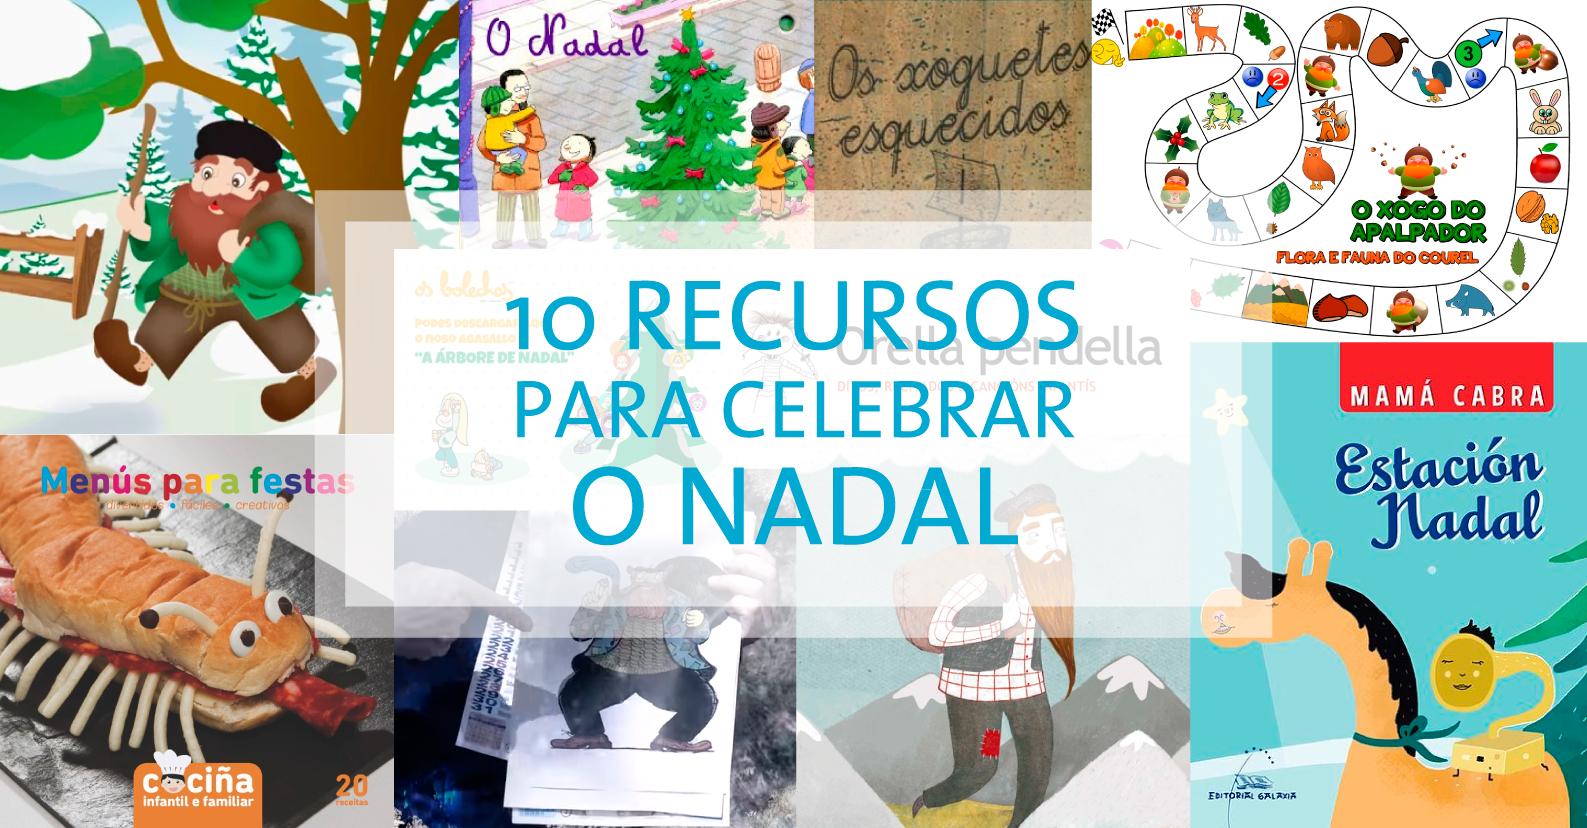 10 Recursos para celebrar o Nadal